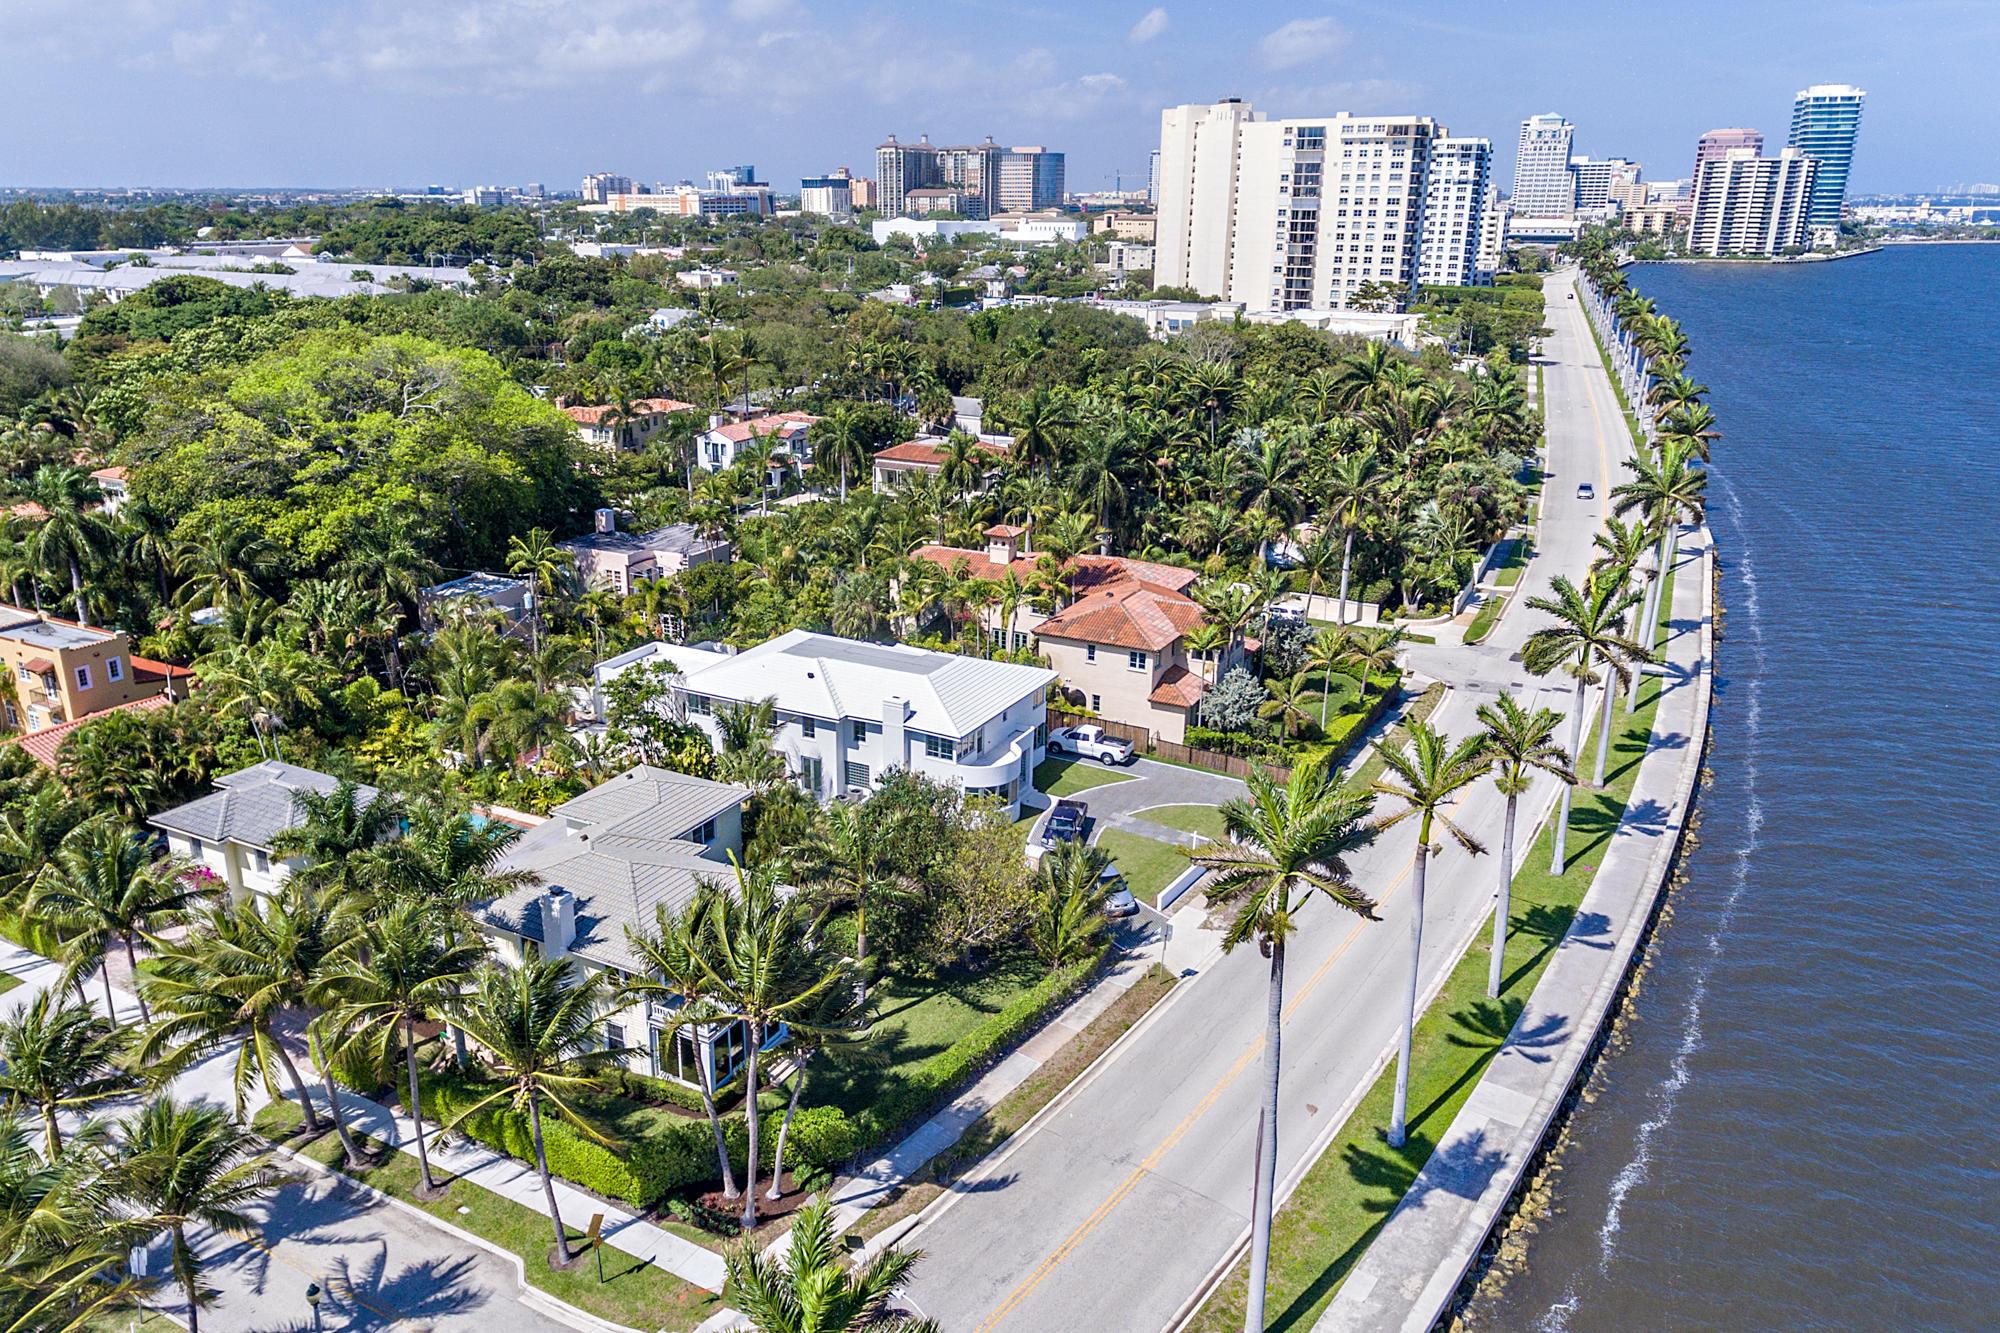 2121 Flagler Drive, West Palm Beach, Florida 33401, 5 Bedrooms Bedrooms, ,5 BathroomsBathrooms,Residential,For Sale,Flagler,RX-10604350